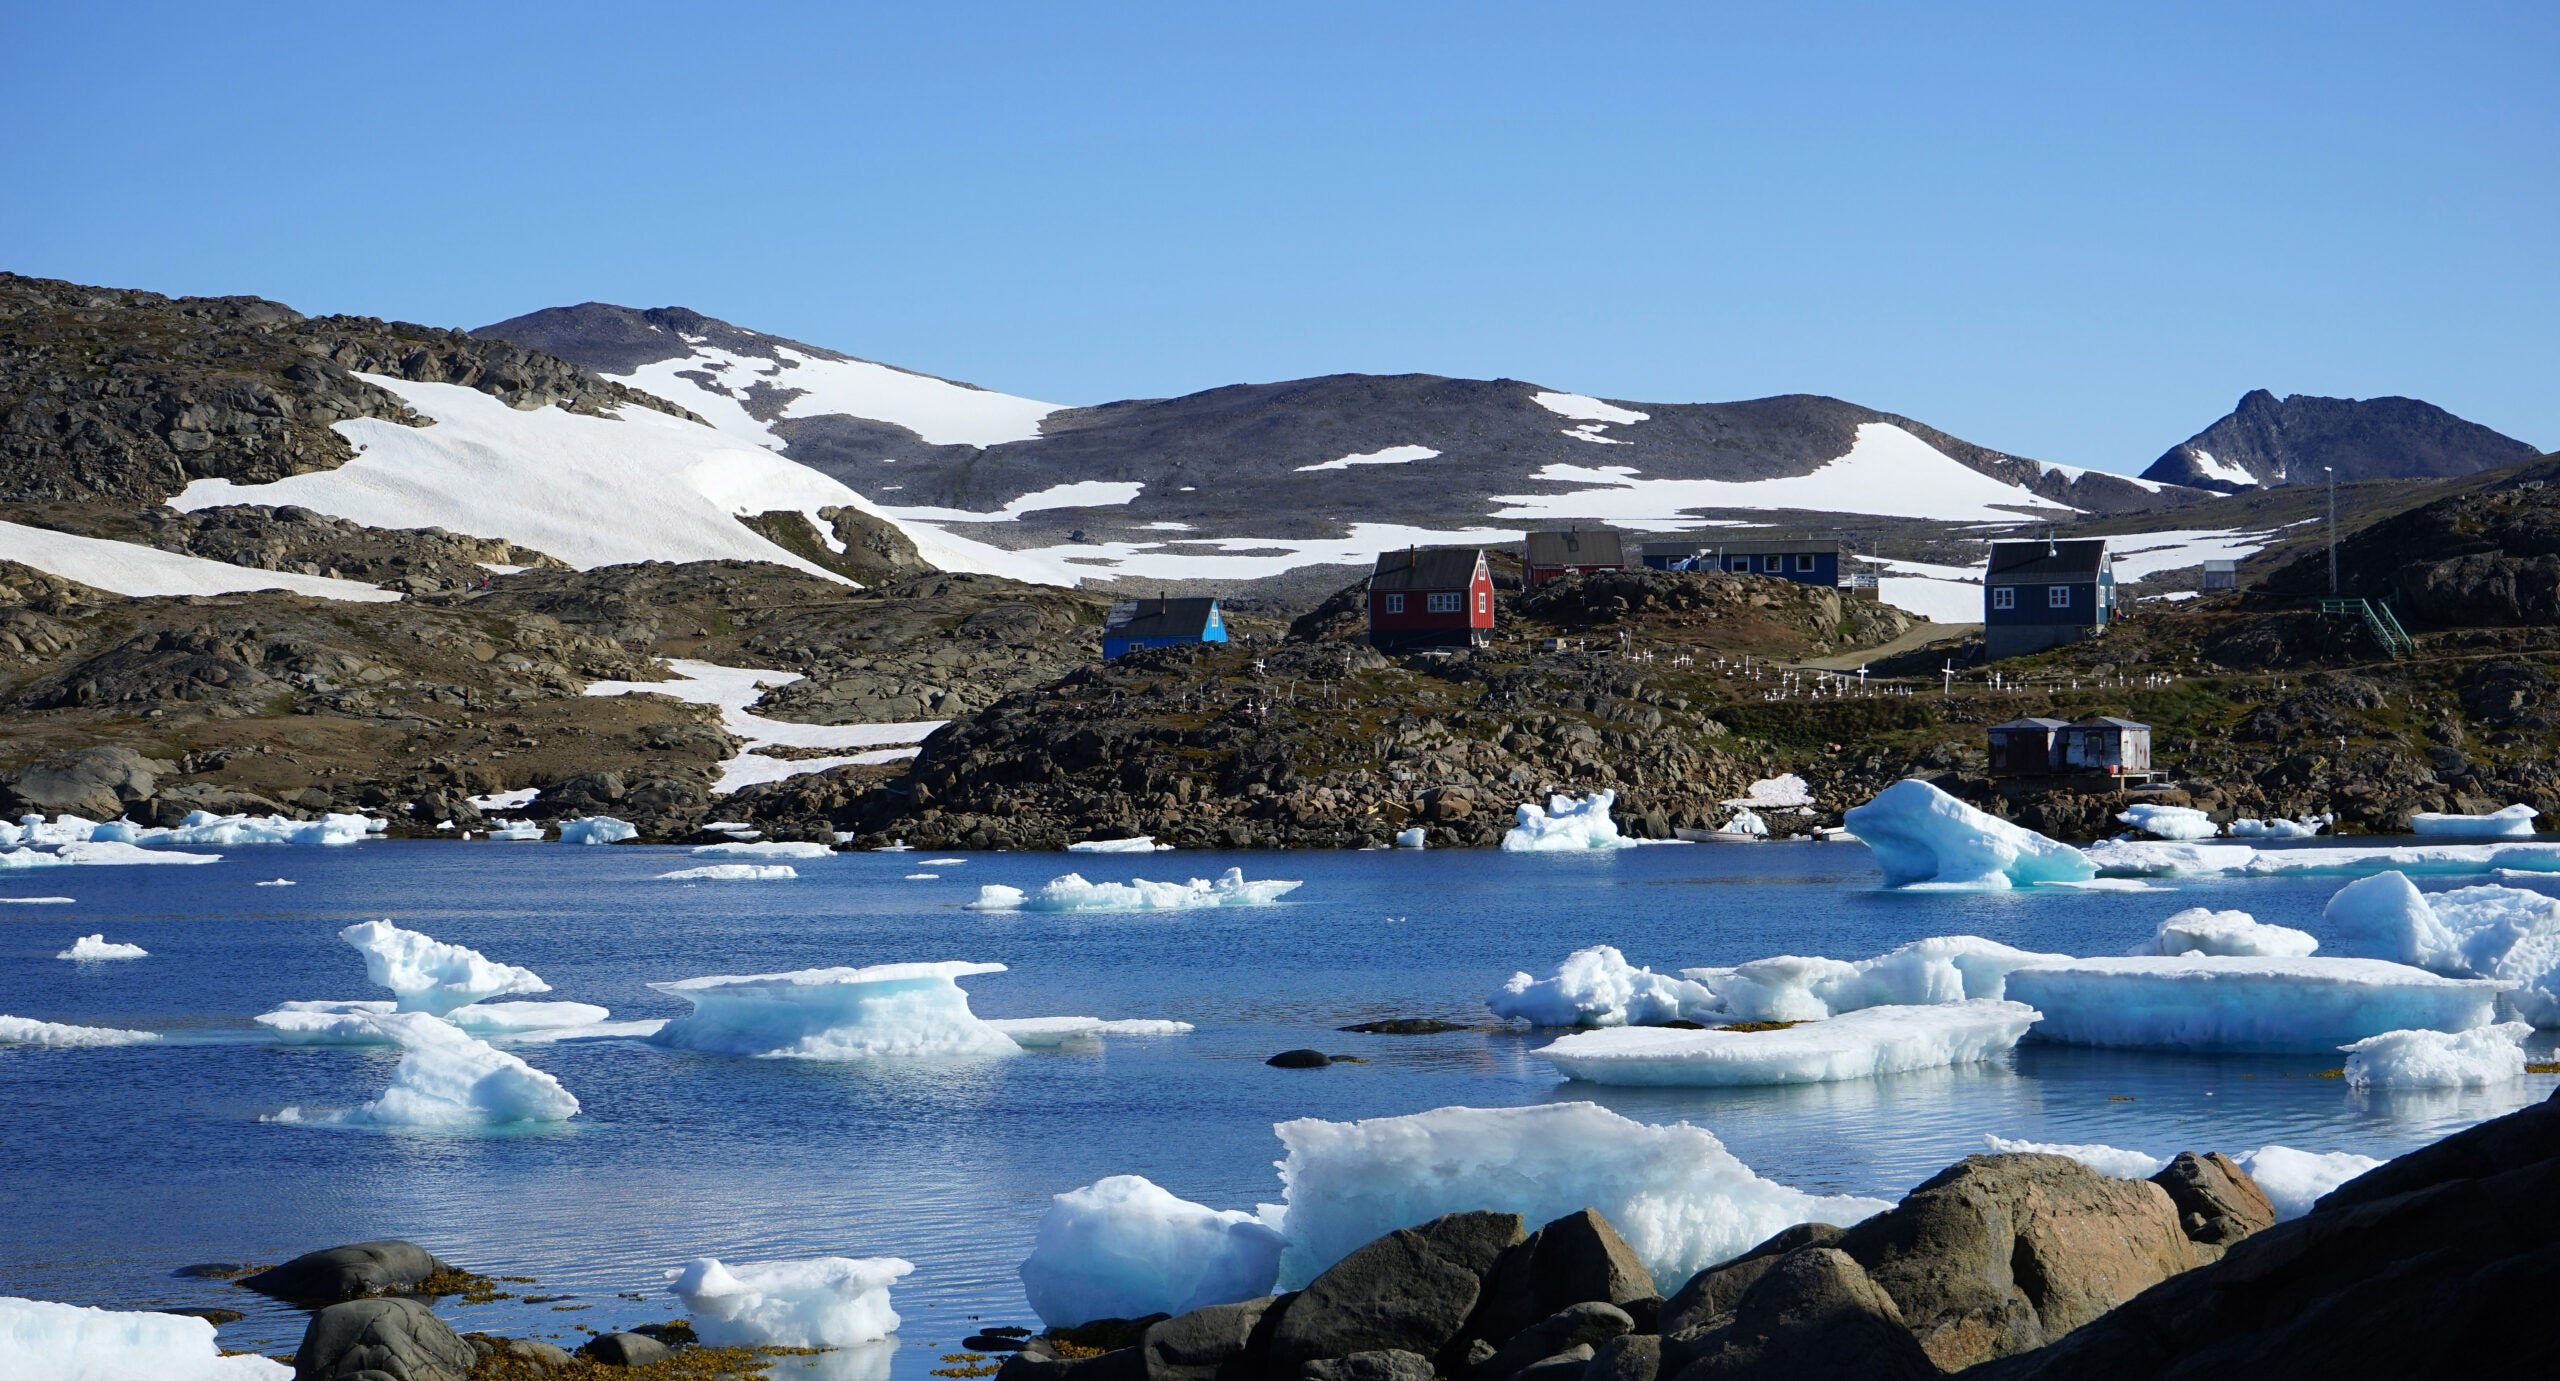 Greenland shore beach sand economy climate change